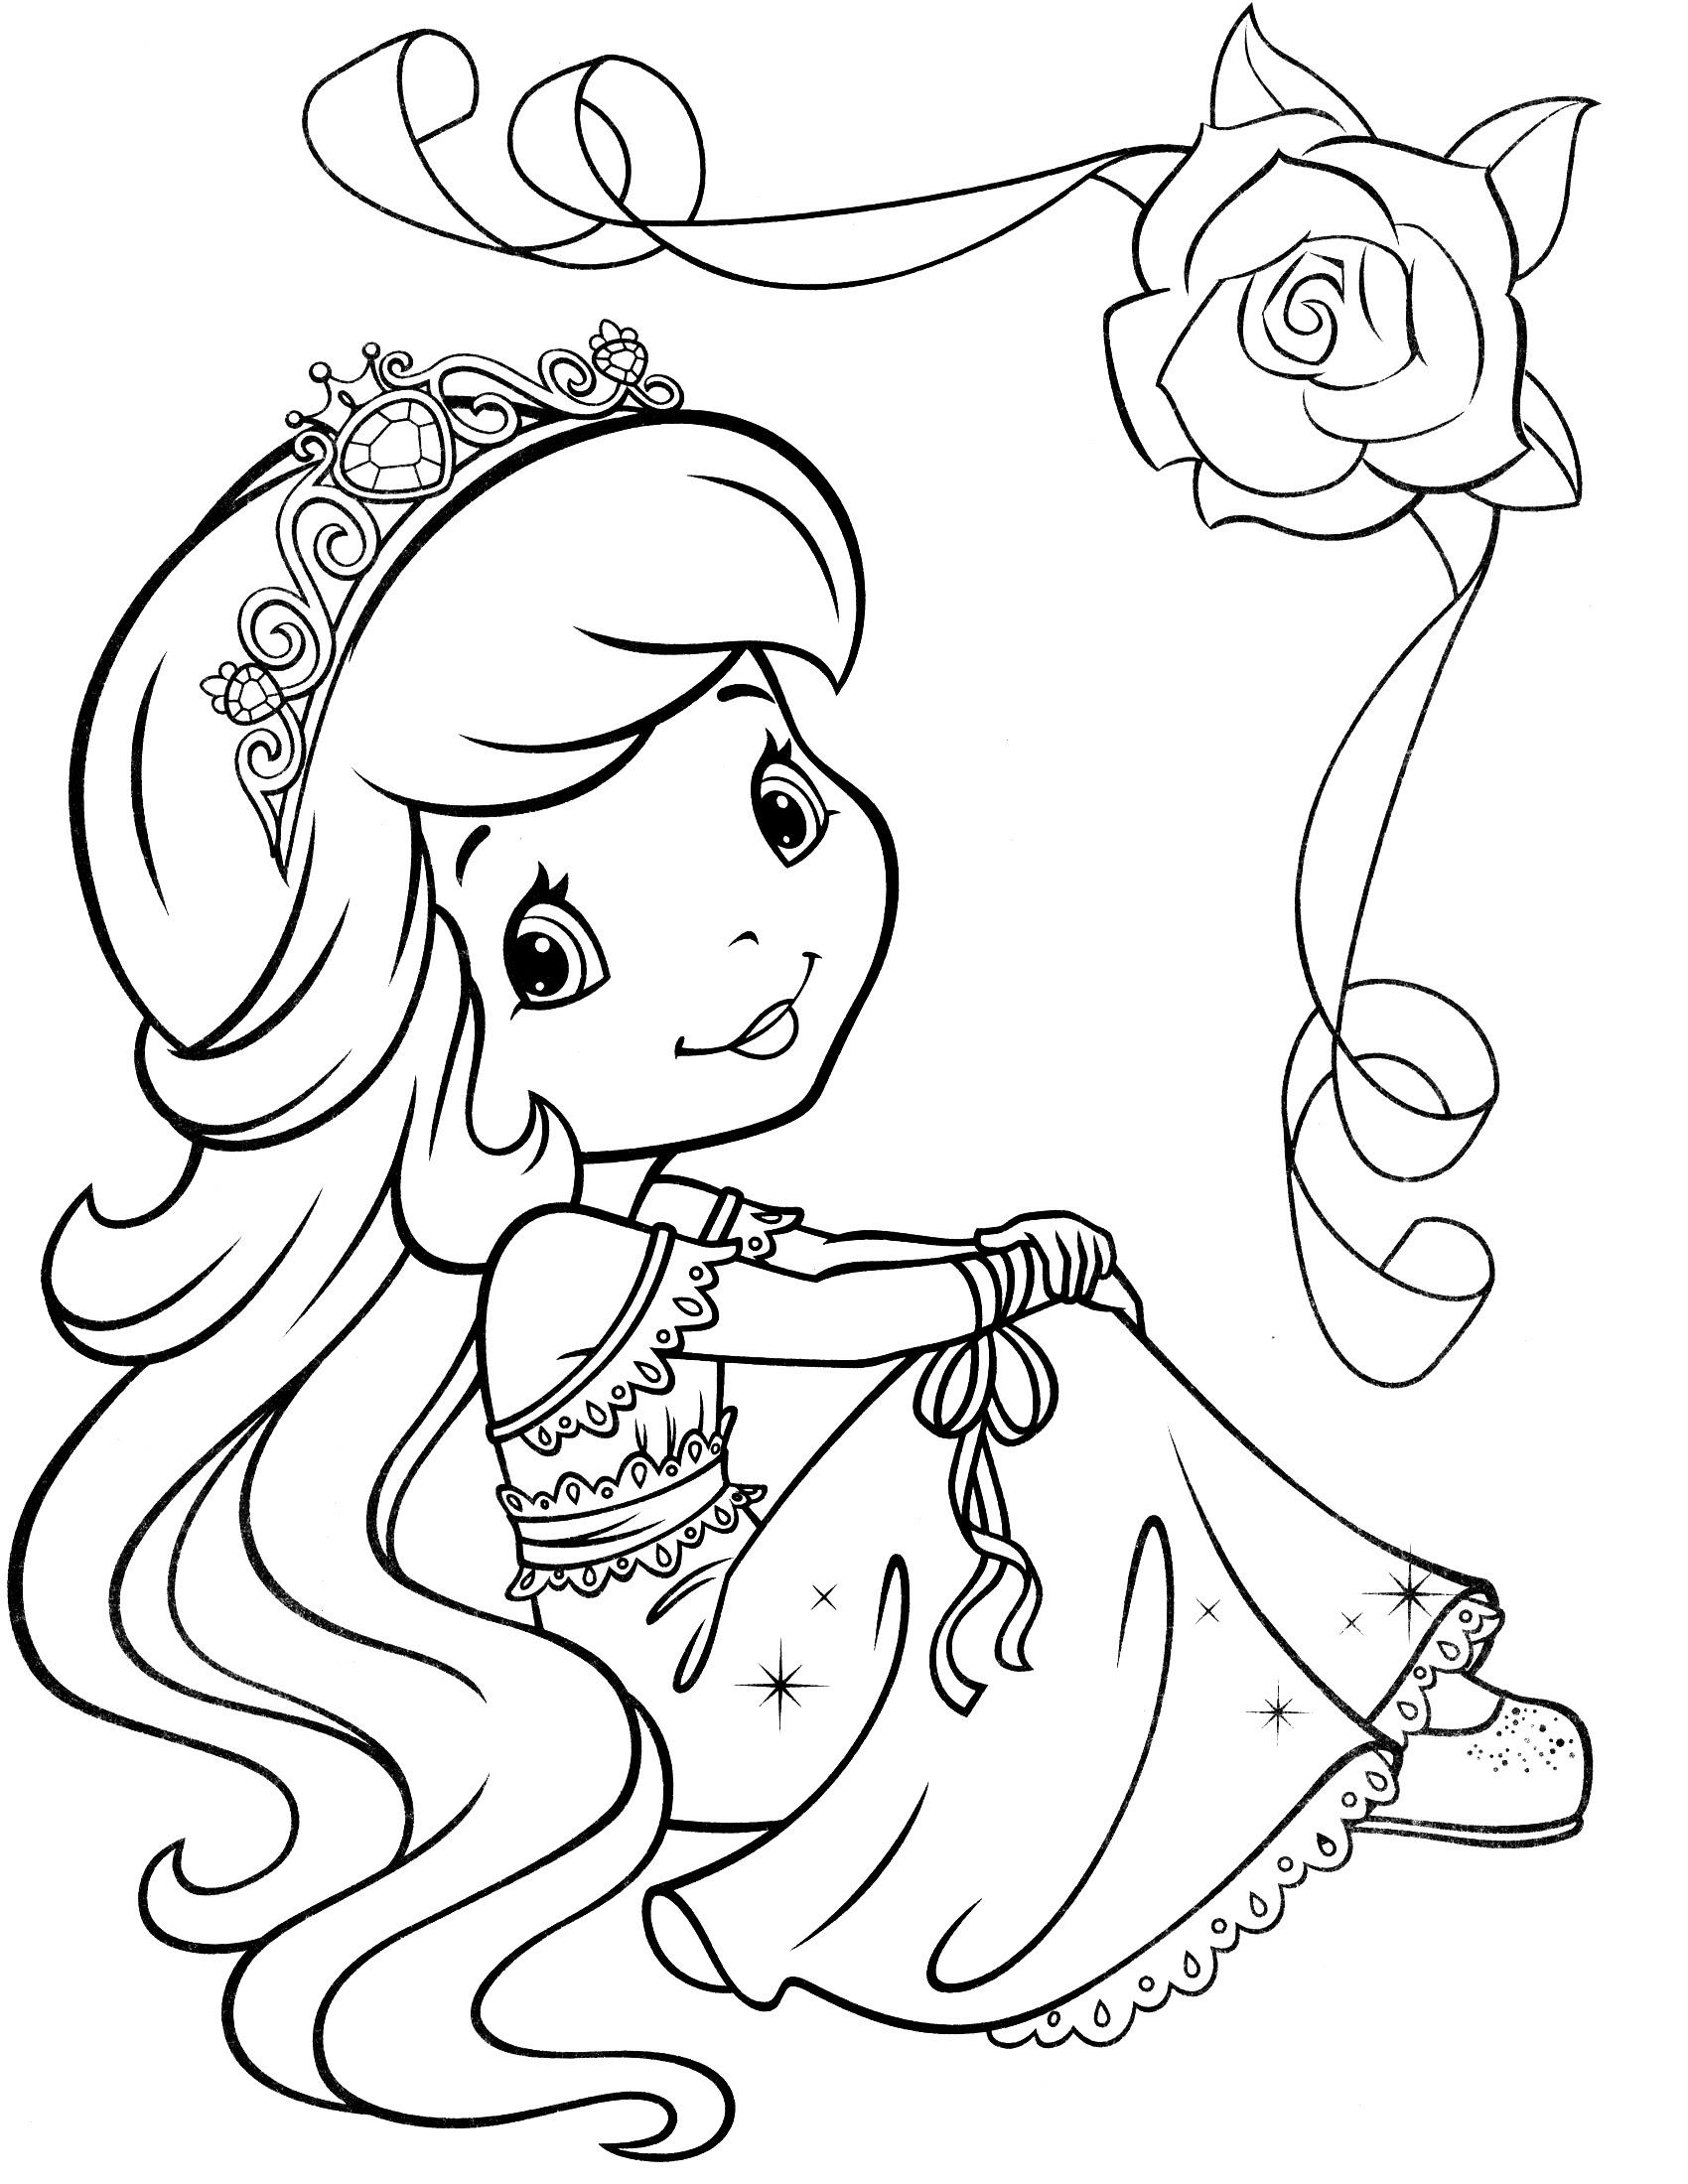 Strawberry Shortcake Princess Coloring Pages At Getdrawingscom